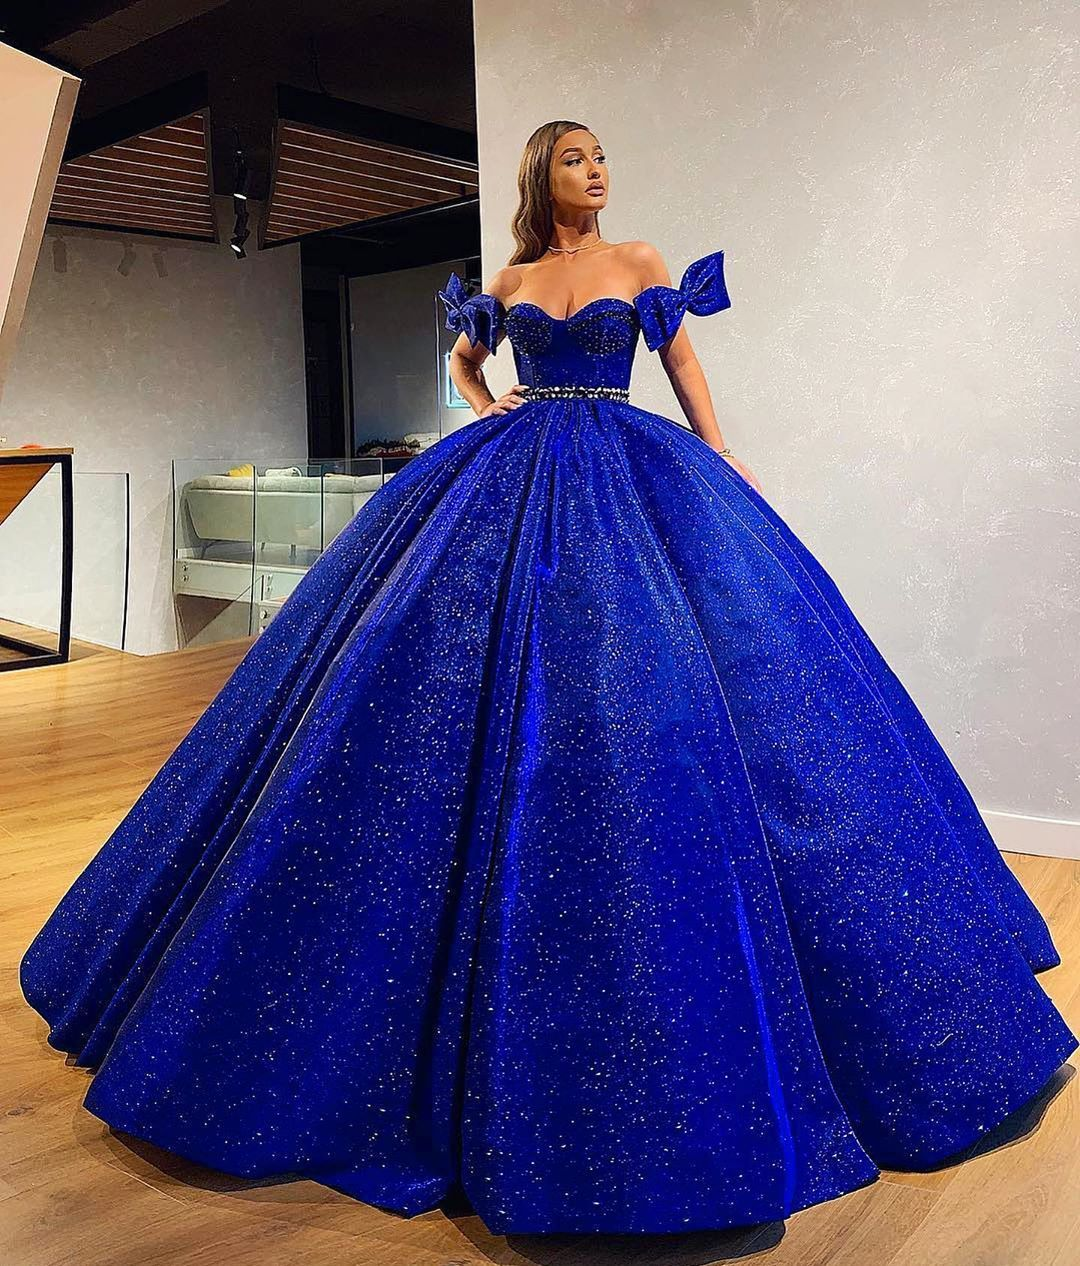 Primary Colors Blue Yellow Or Red Which Is Ur Fave Designer Walonefashiongroup Prinzessin Kleid Abschlussball Kleider Ballkleid [ 1266 x 1080 Pixel ]